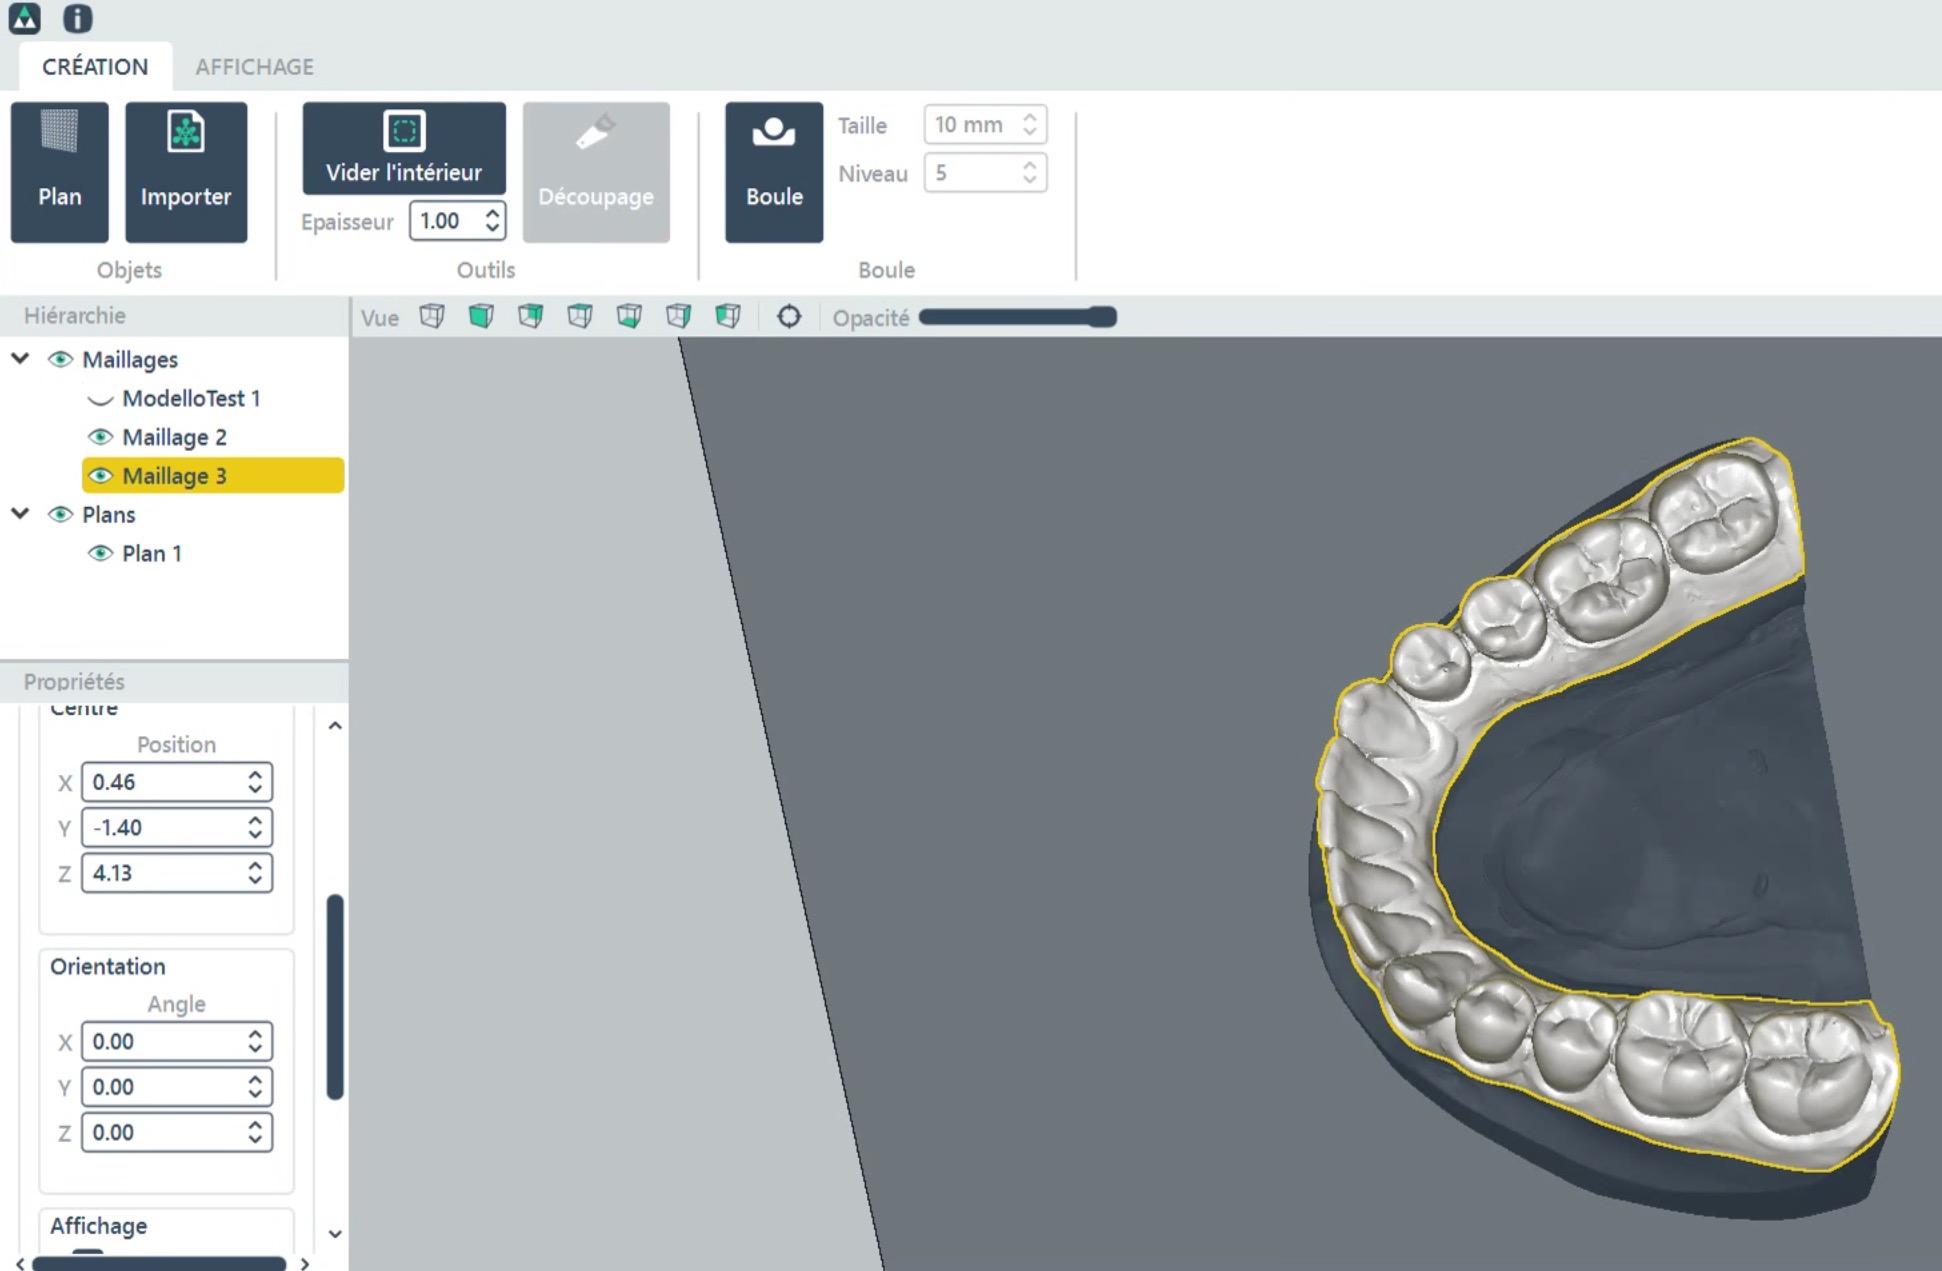 Deltaface's CORUO dental optimization software